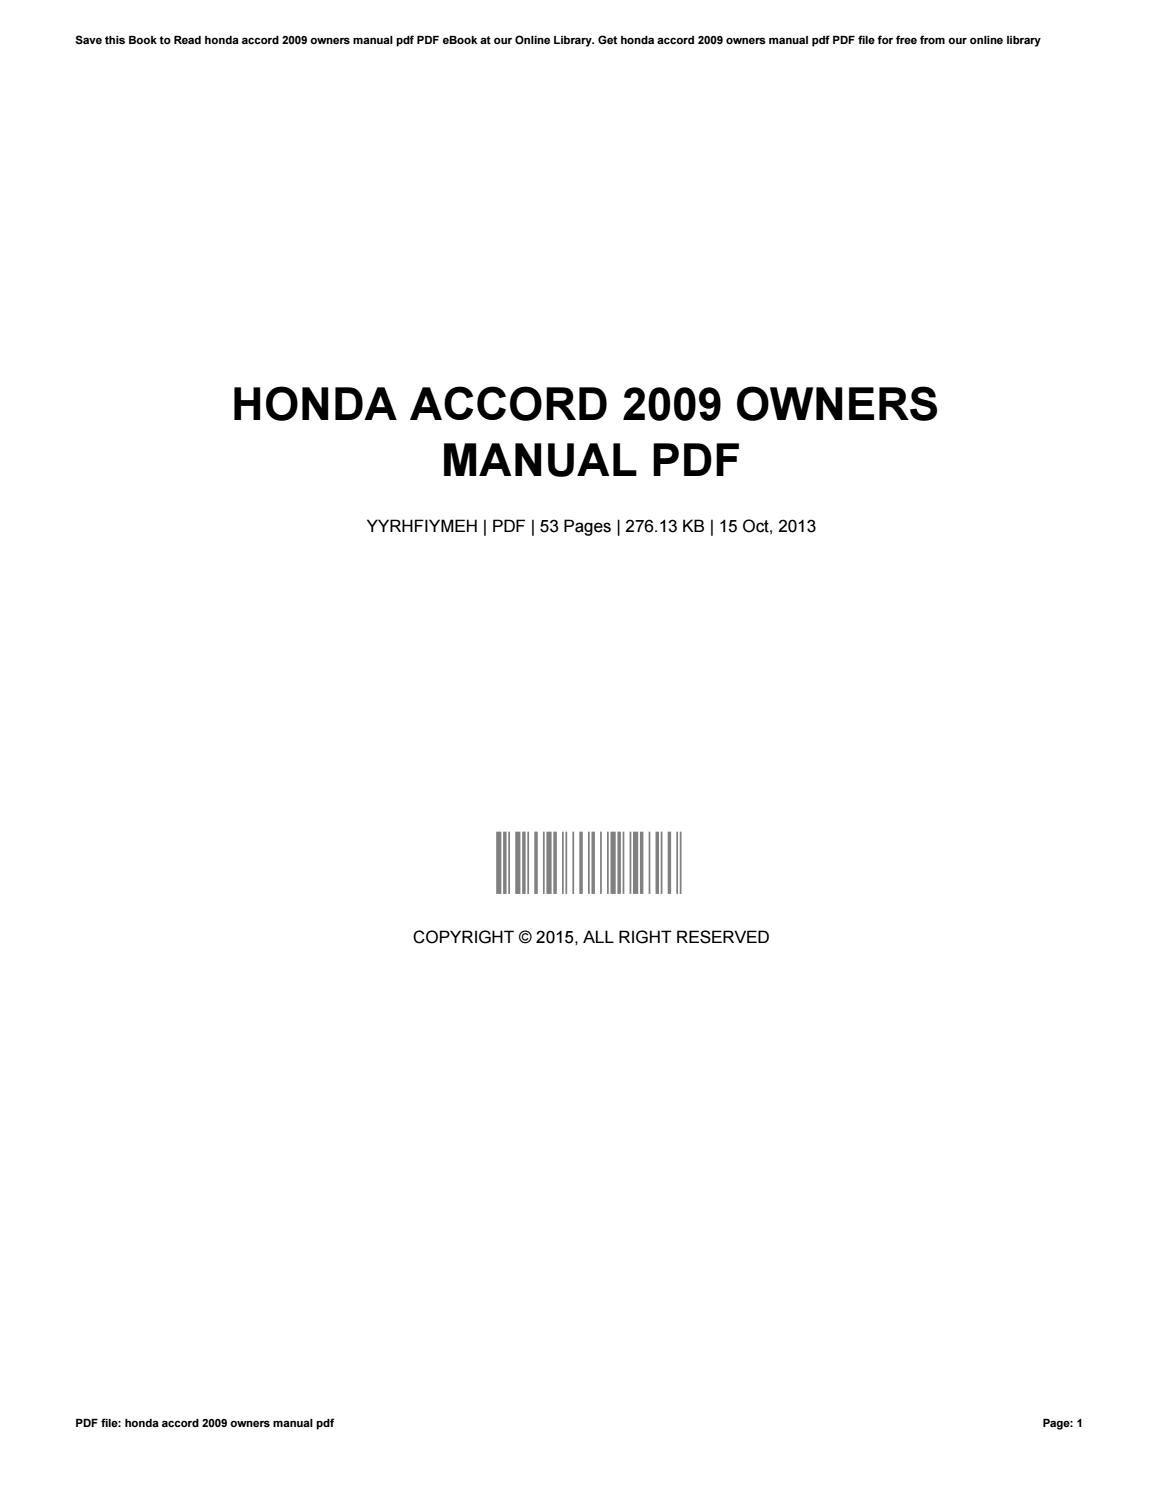 honda accord 2003 service repair manual